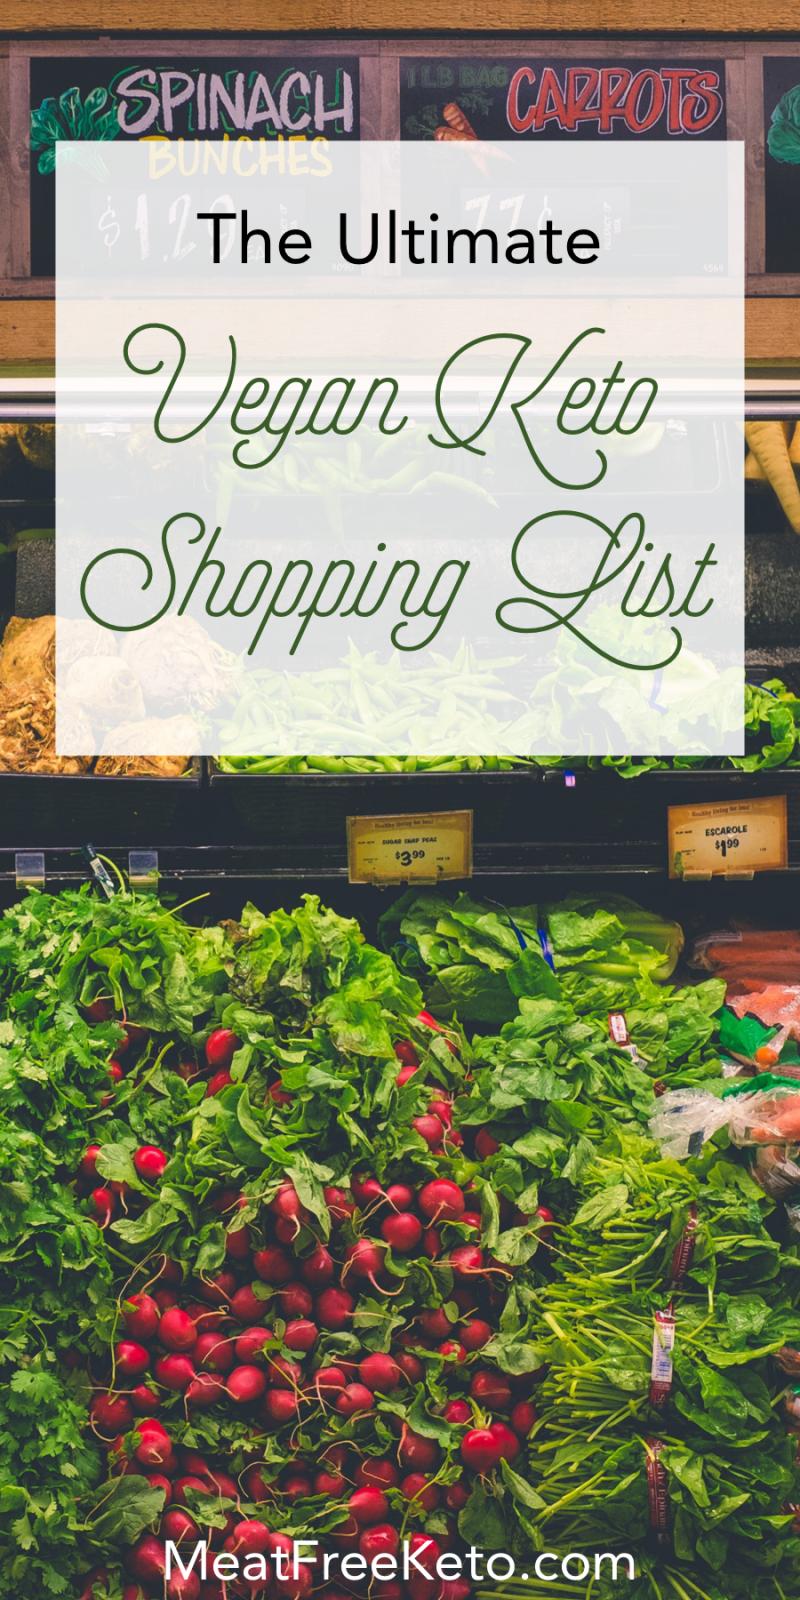 The Ultimate Vegan Keto Shopping List Let's go KETO in